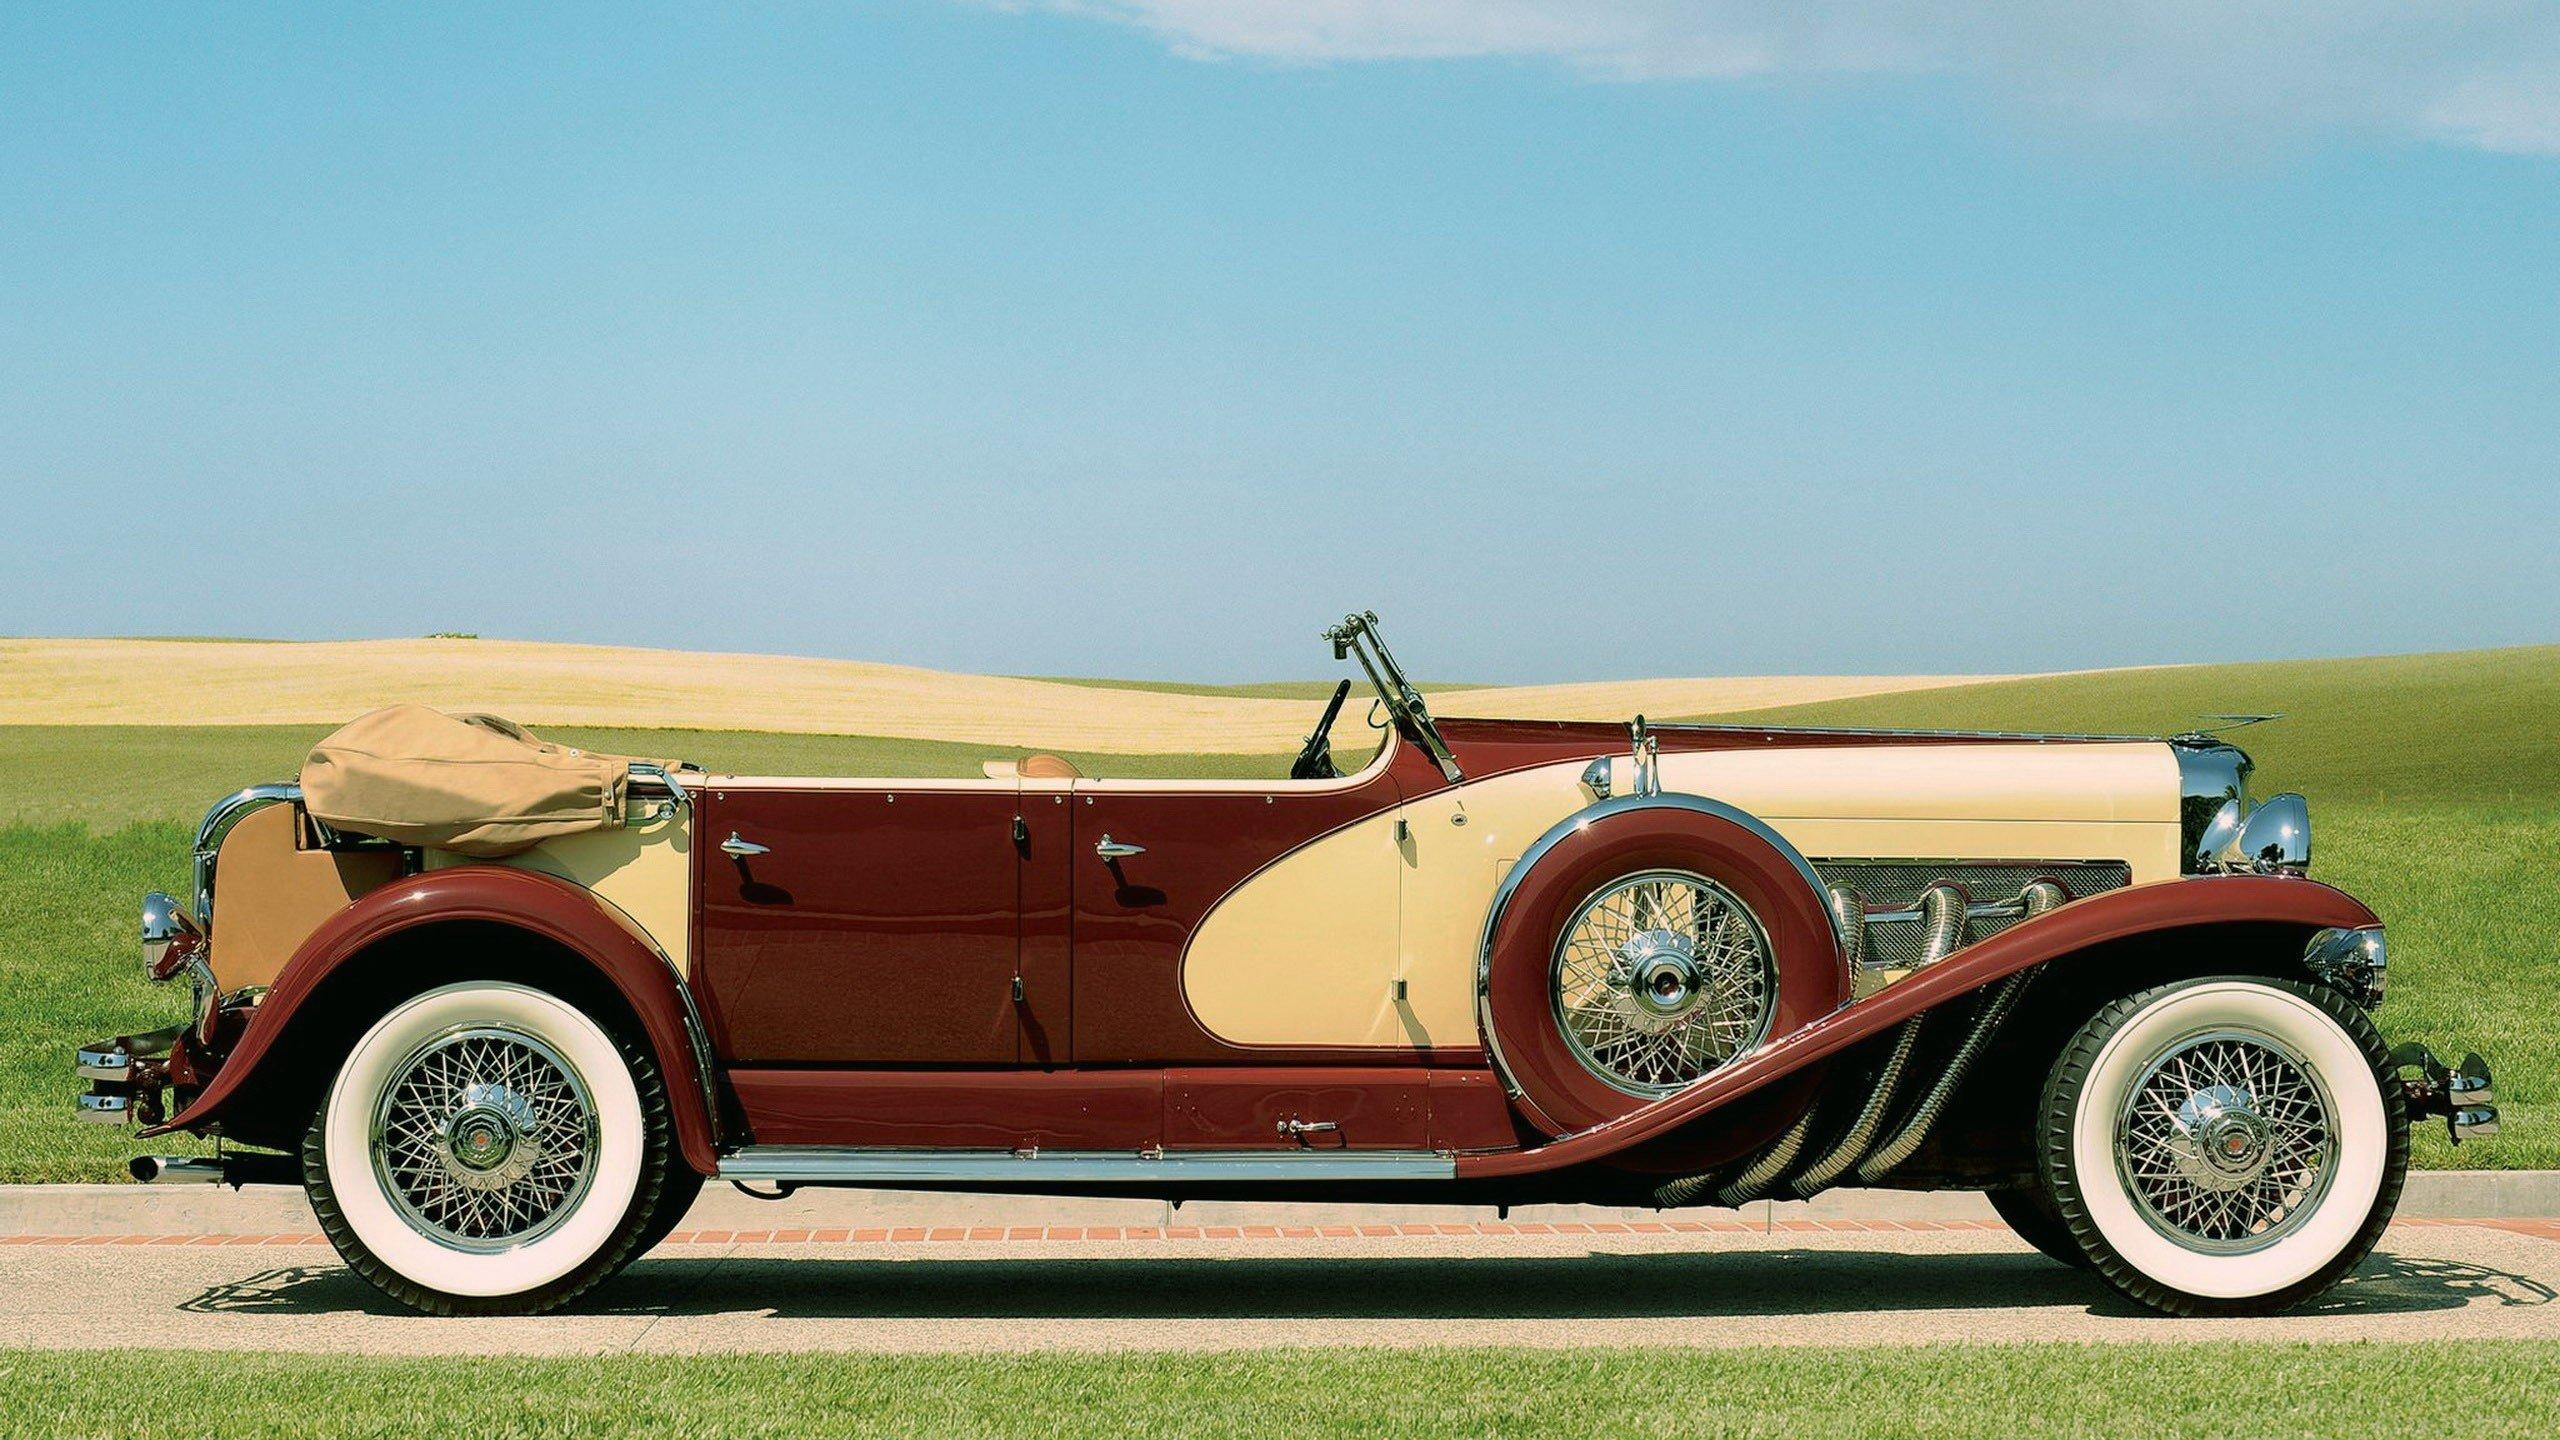 duesenberg vintage car wallpapers - photo #37